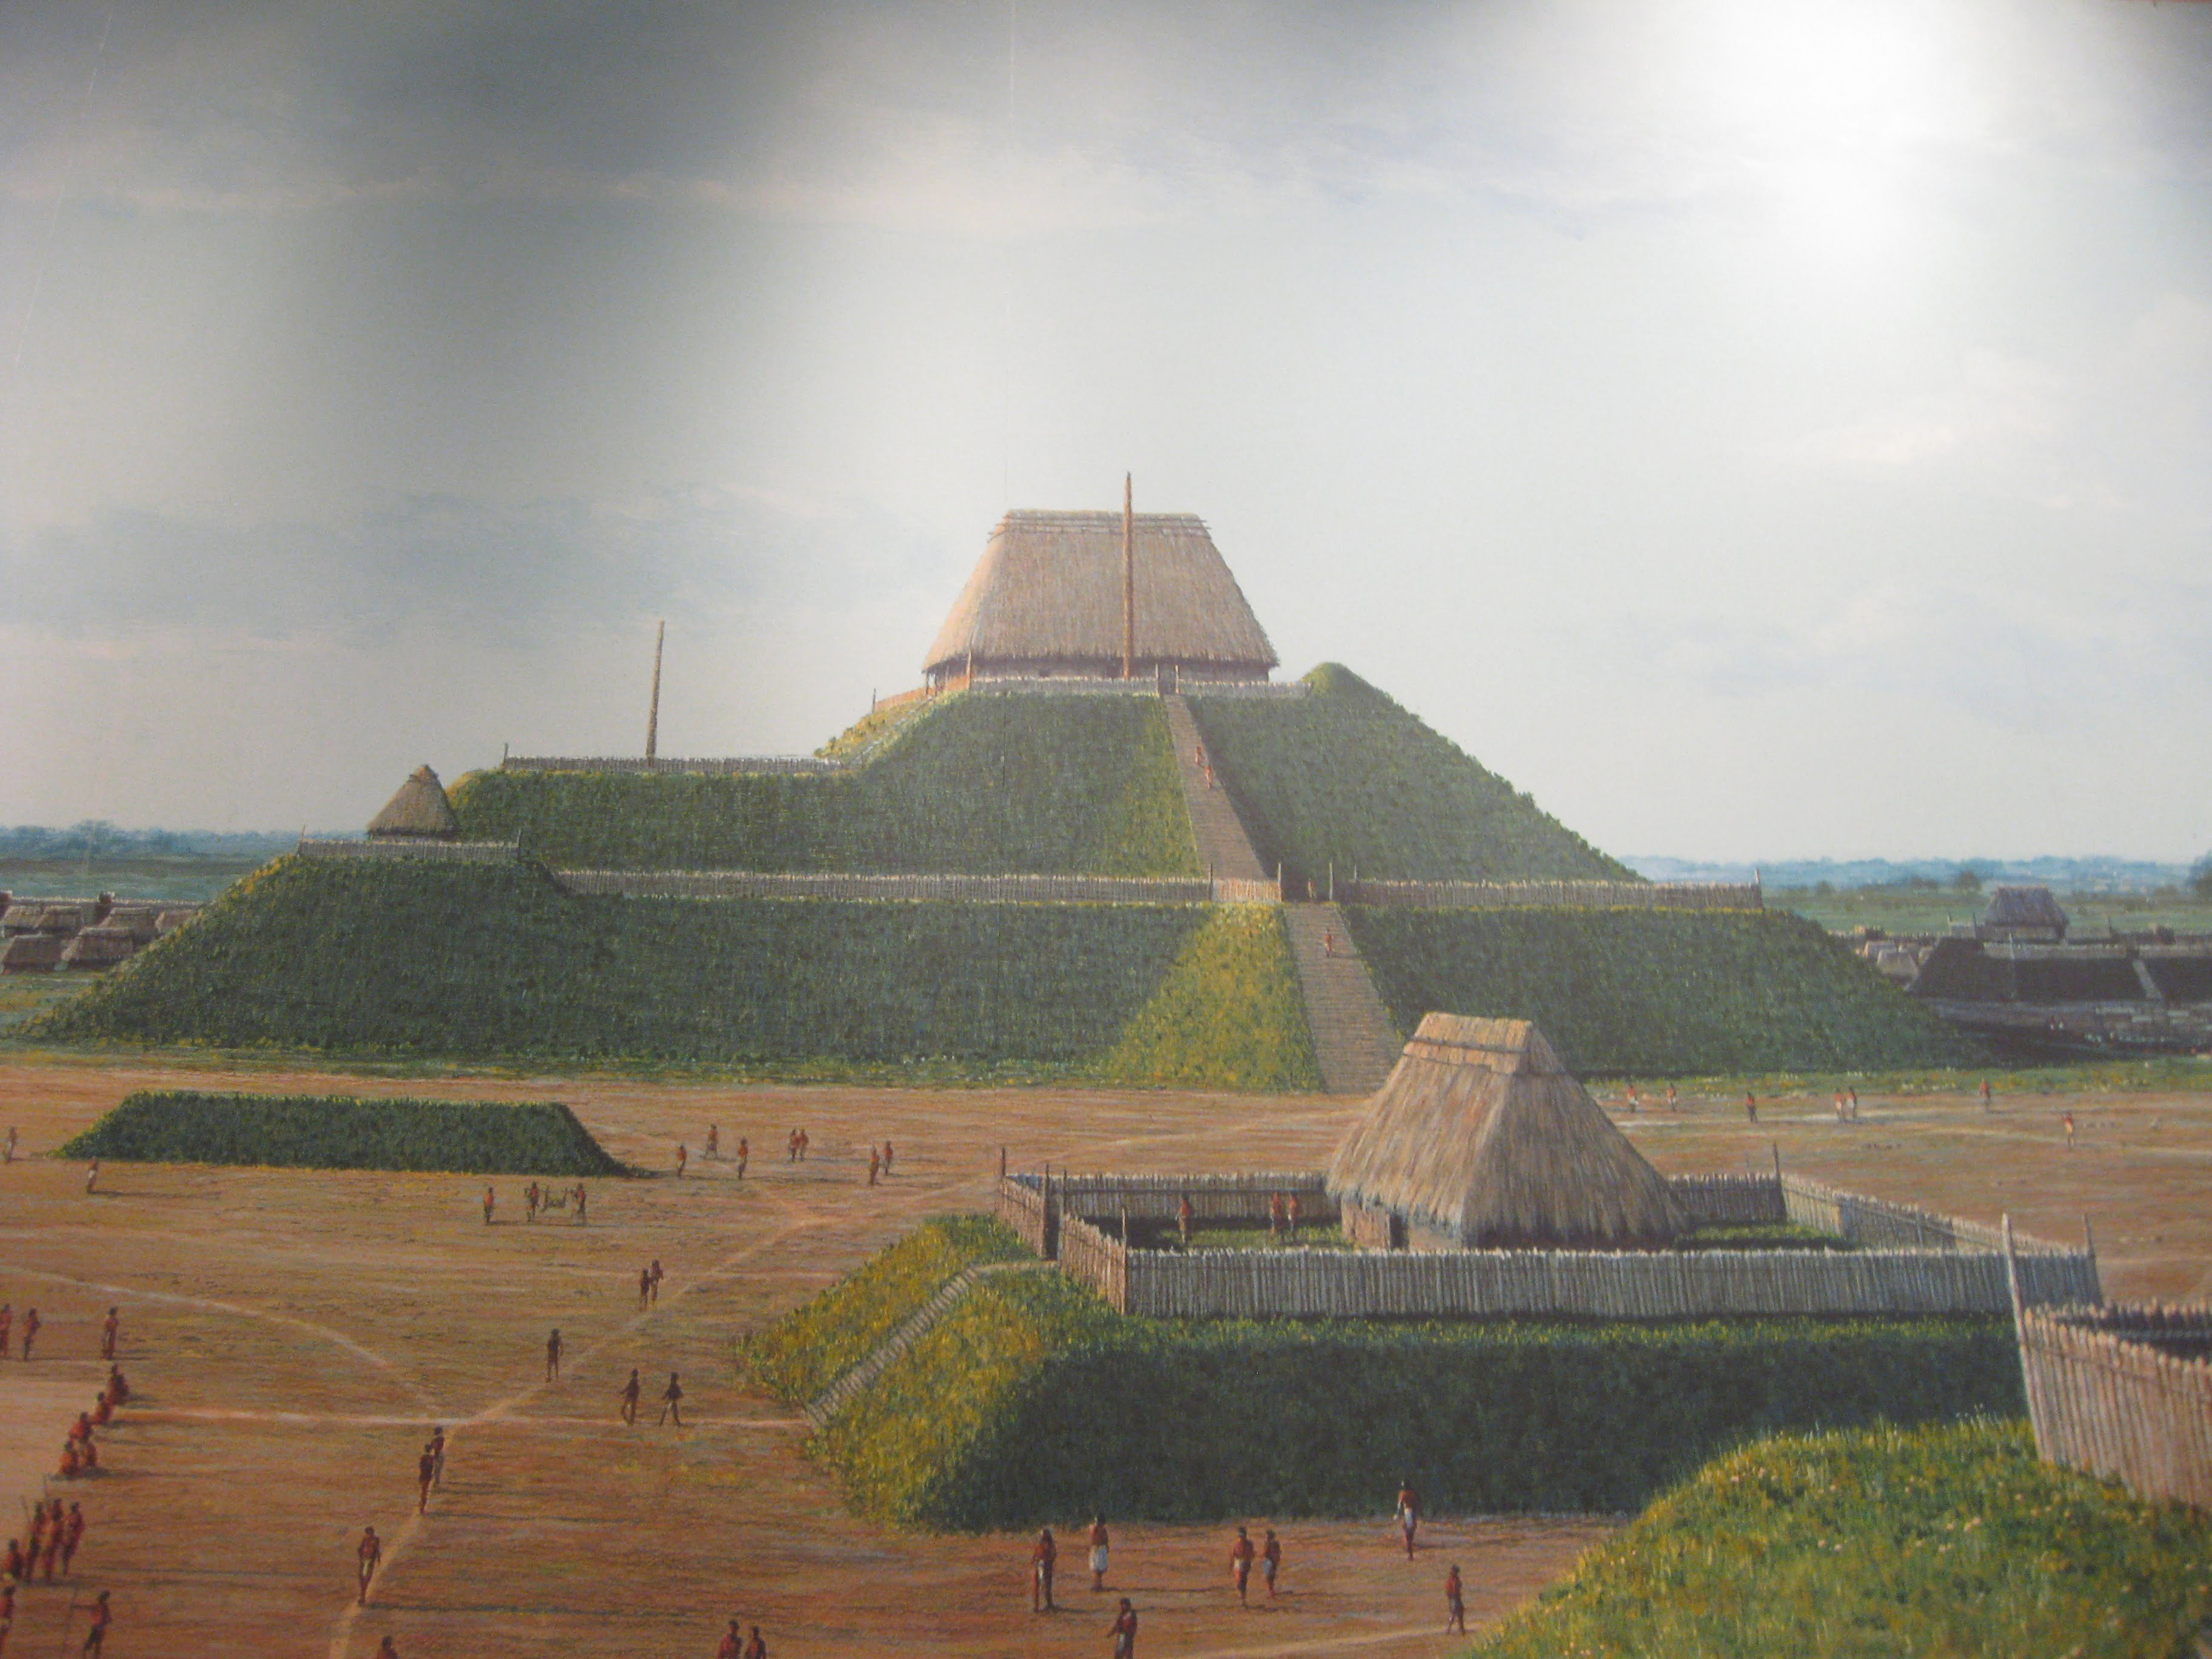 Castine Indian Mounds | Access Genealogy